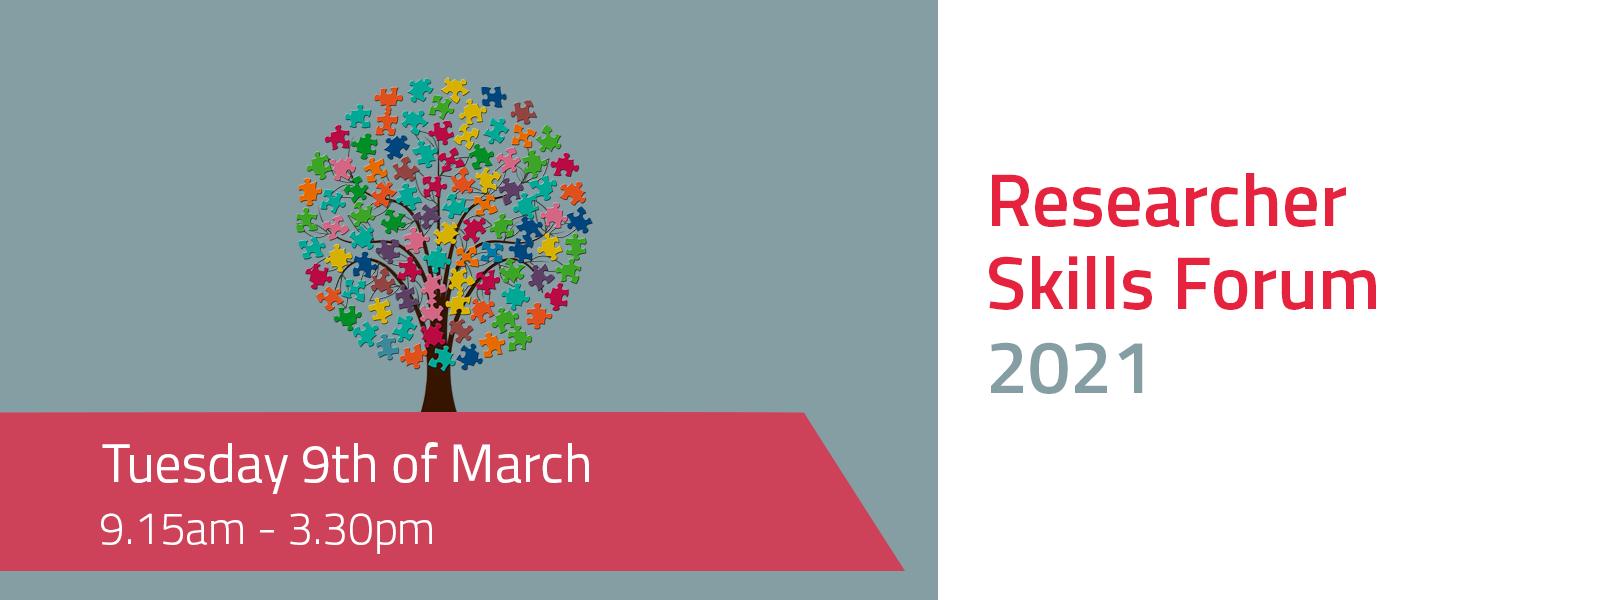 Researcher Skills Forum